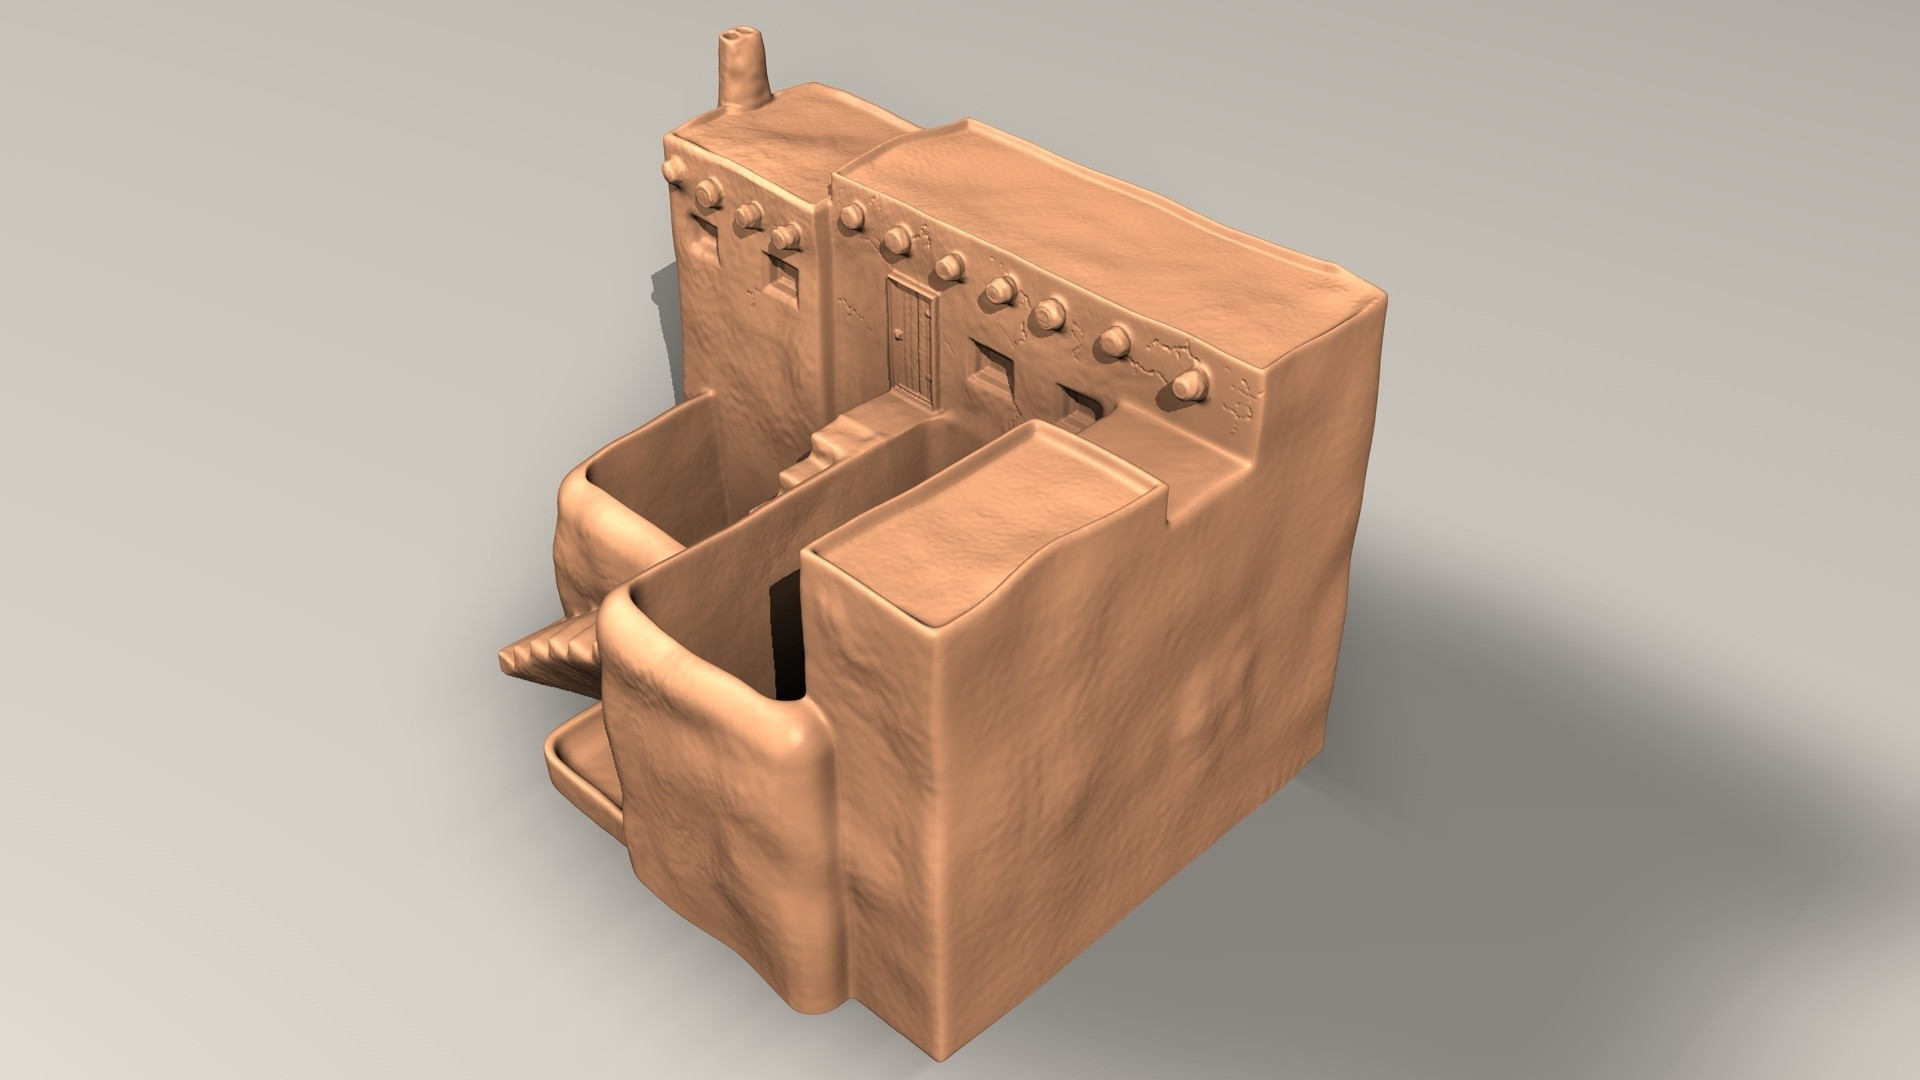 pueblo-C.jpg Download STL file Pueblo desk pot • 3D printer model, pumpkinhead3d